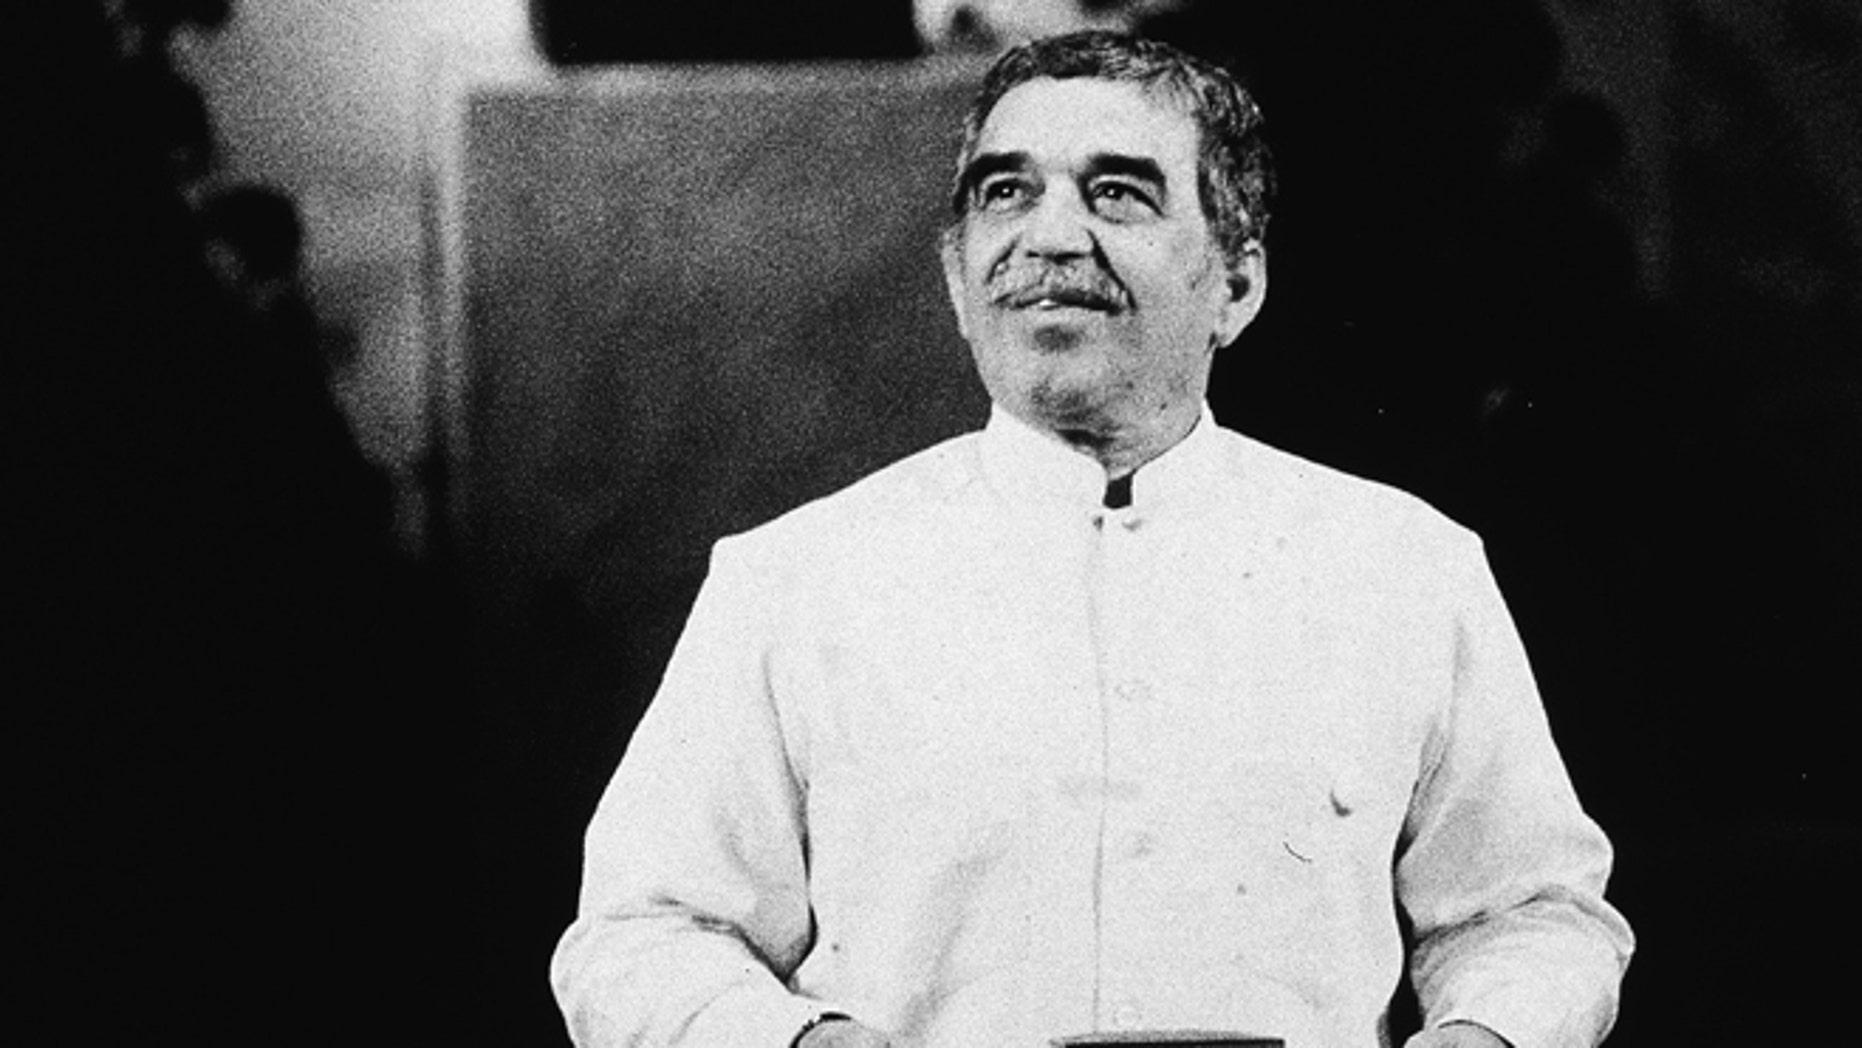 Garcia Marquez speaks at a podium after receiving the Nobel Prize in Literature, Sweden, 1982.